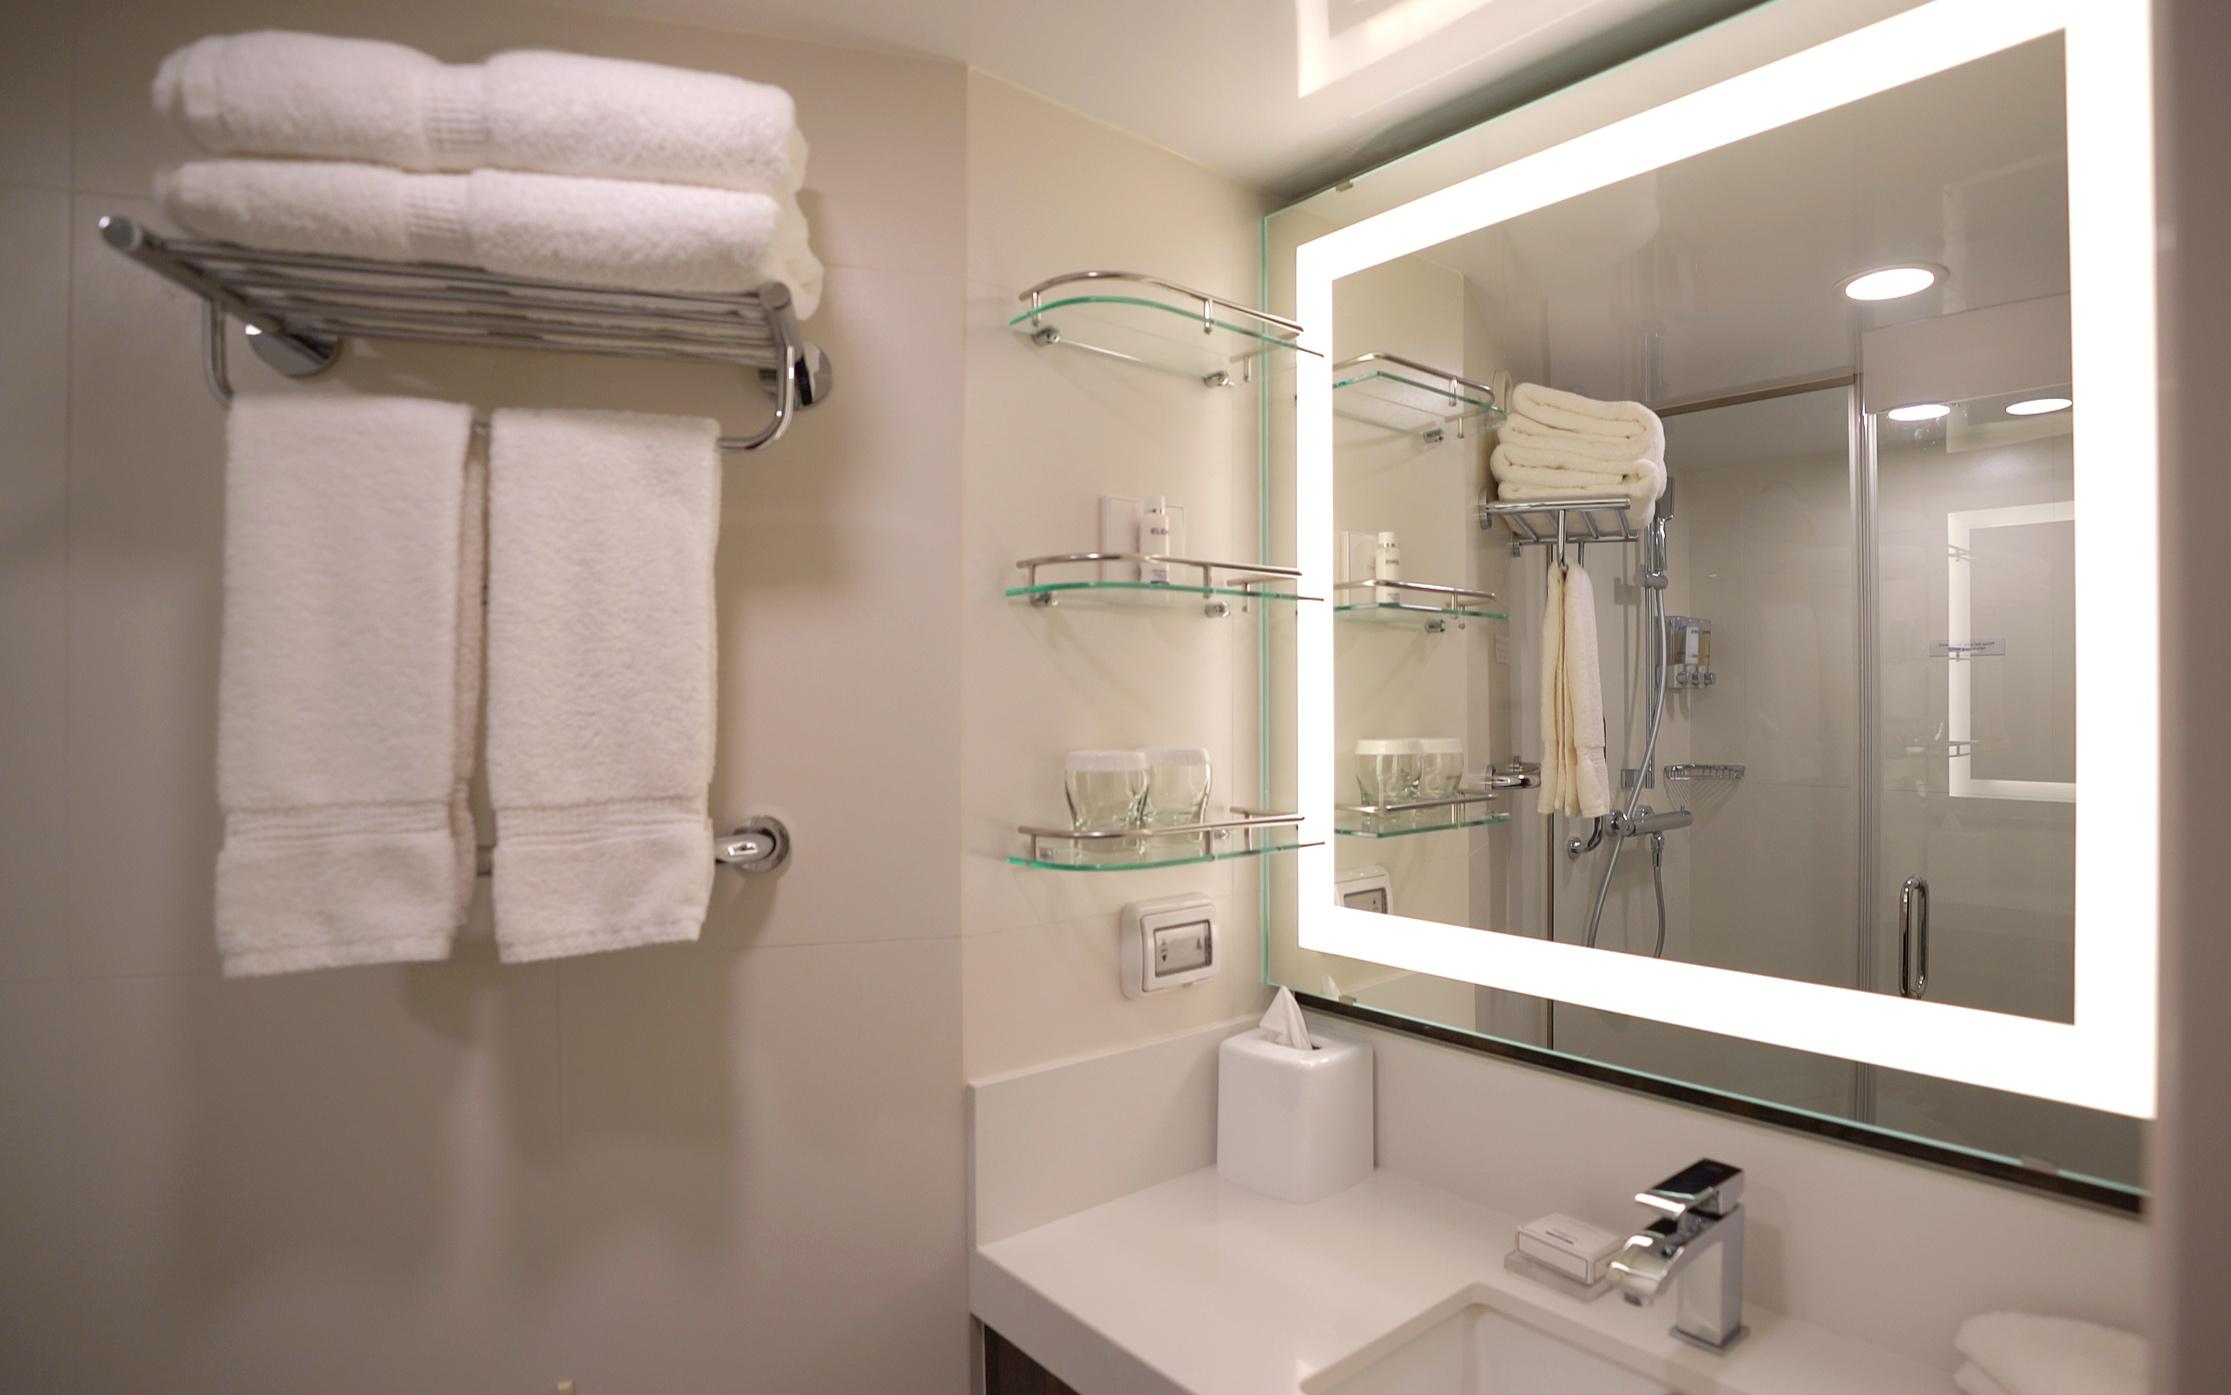 Lovely large, well-lit bathroom